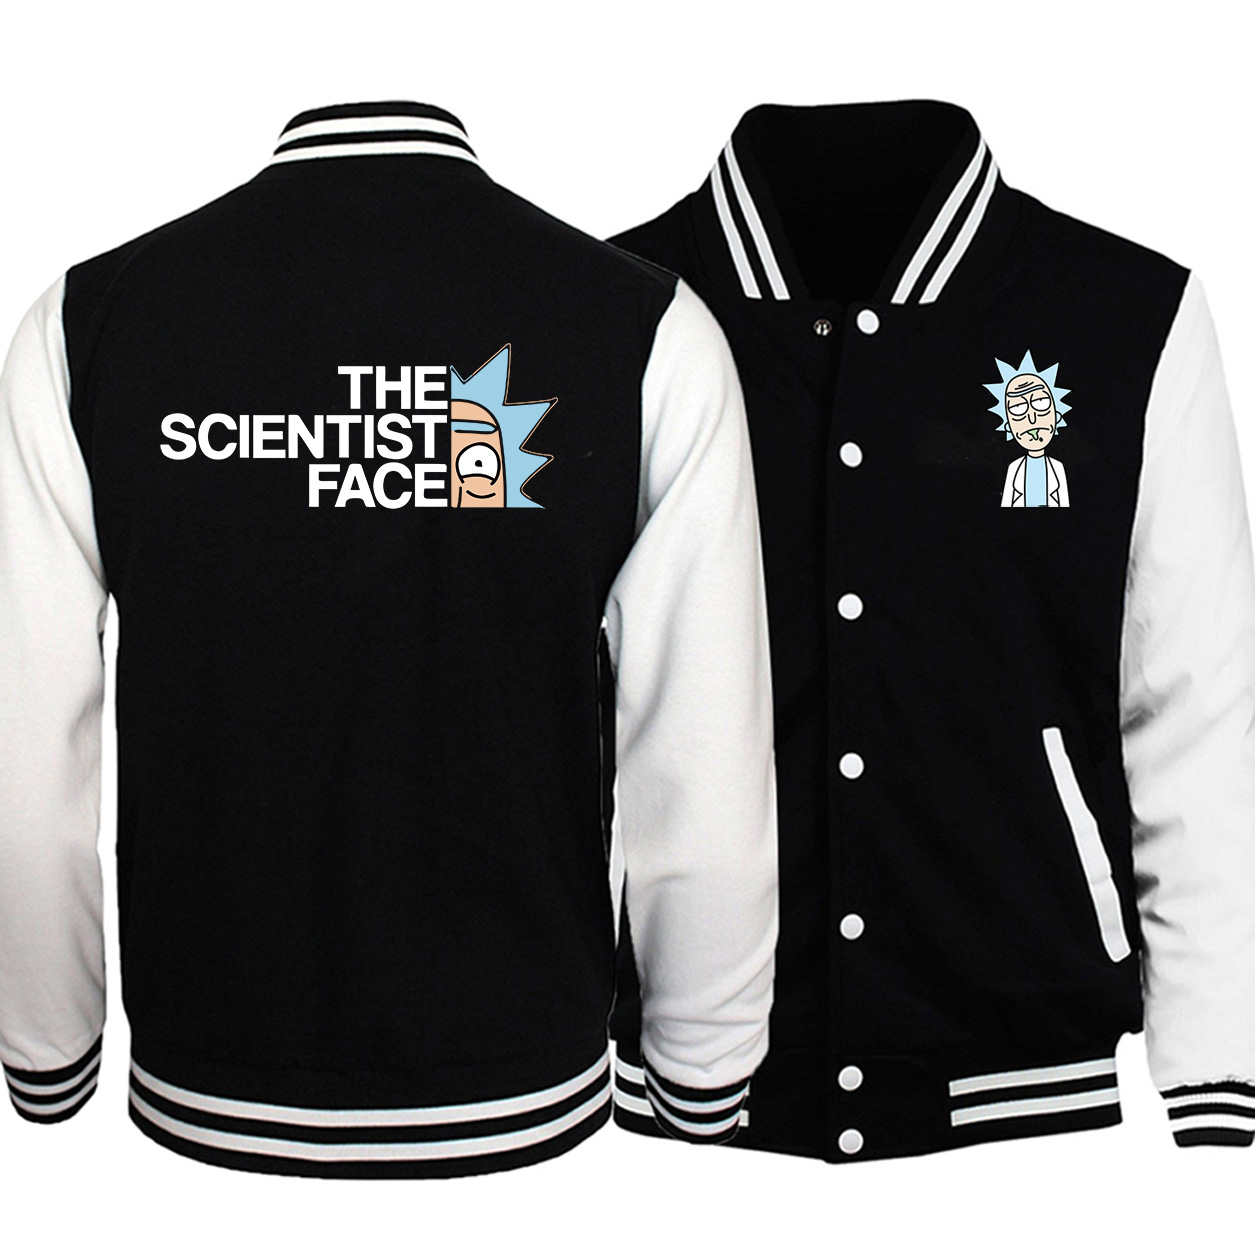 THE SCIENTIST FACE Male Jacket Spring Autumn Fleece Streetwear Coat Rick And Morty Stylish Mens Baseball Uniform Military Bomber